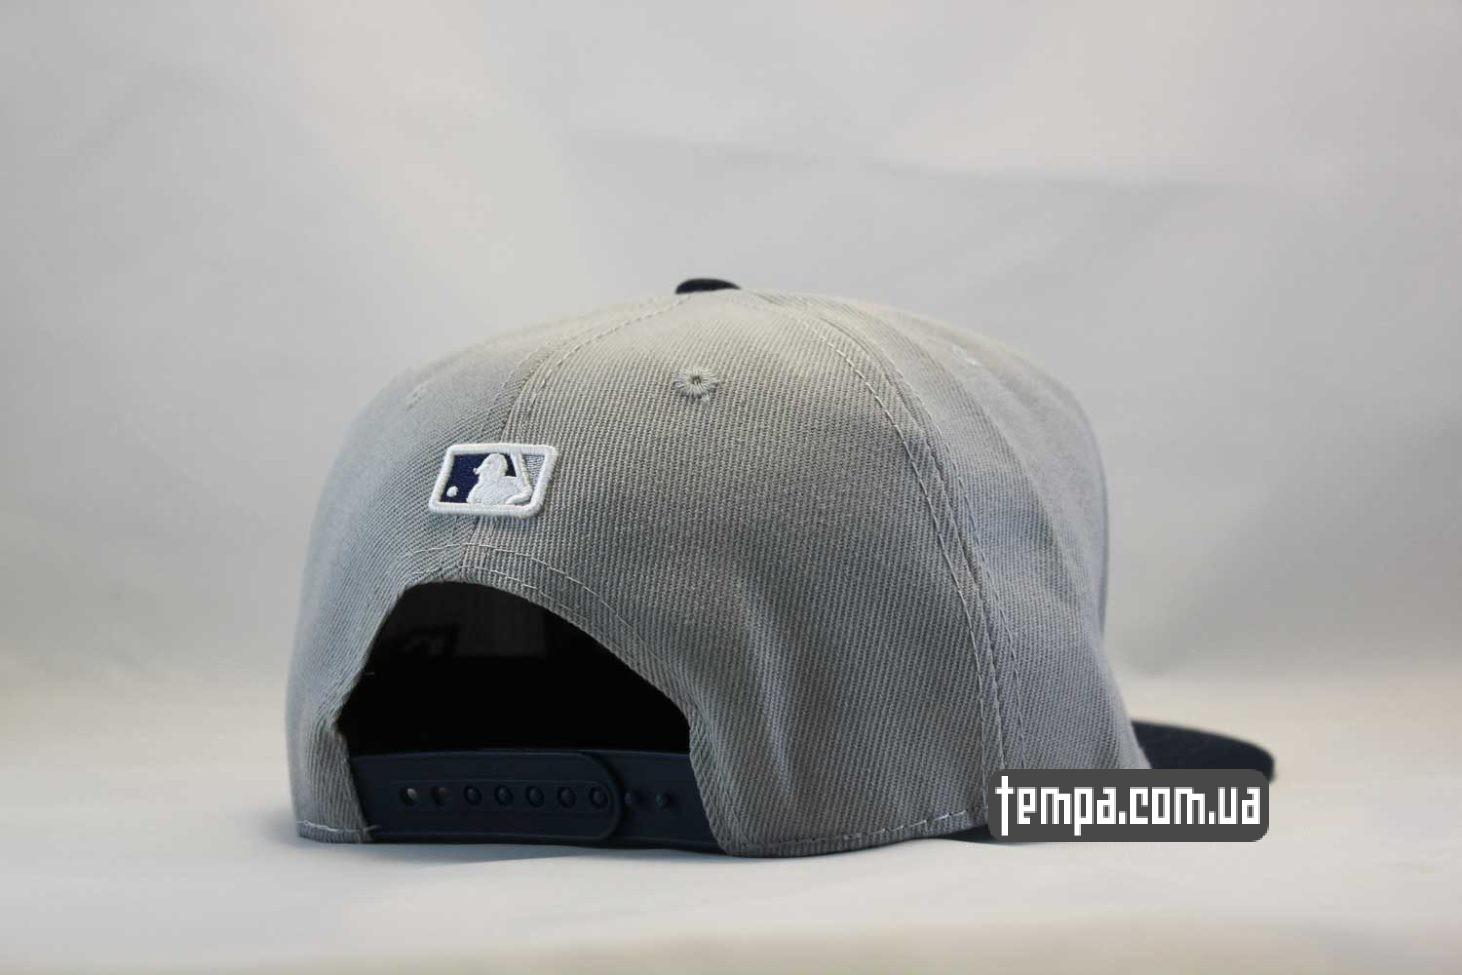 бейсболка кепка snapback Yankees New York NY New Era серая с синим логотипом